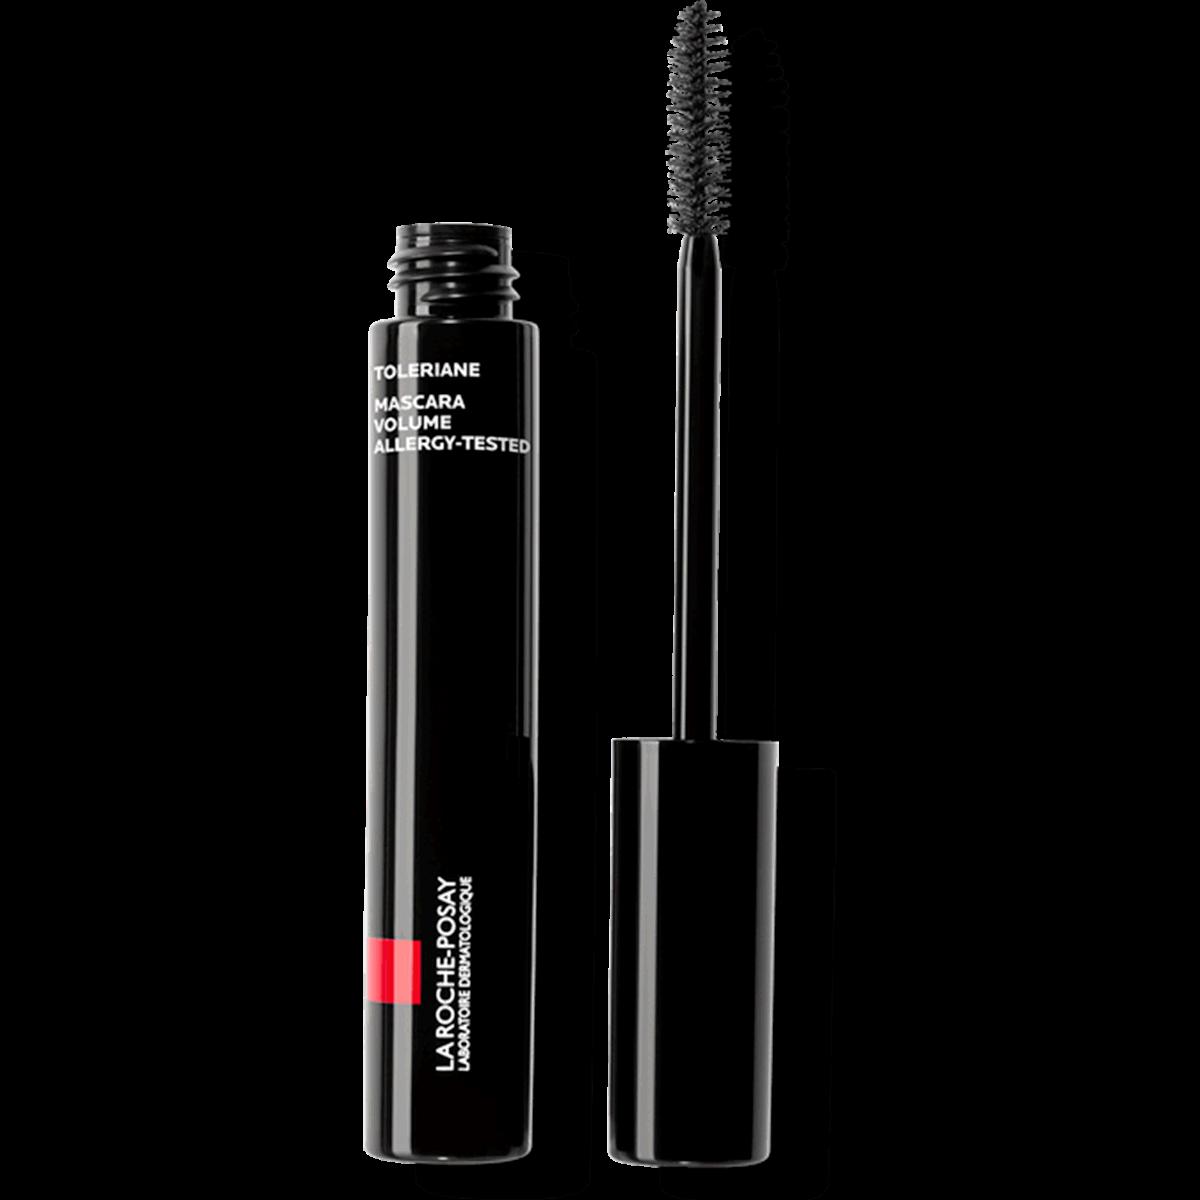 La Roche Posay Sensitive Toleriane Make up VOLUME_MASCARA Black 333787